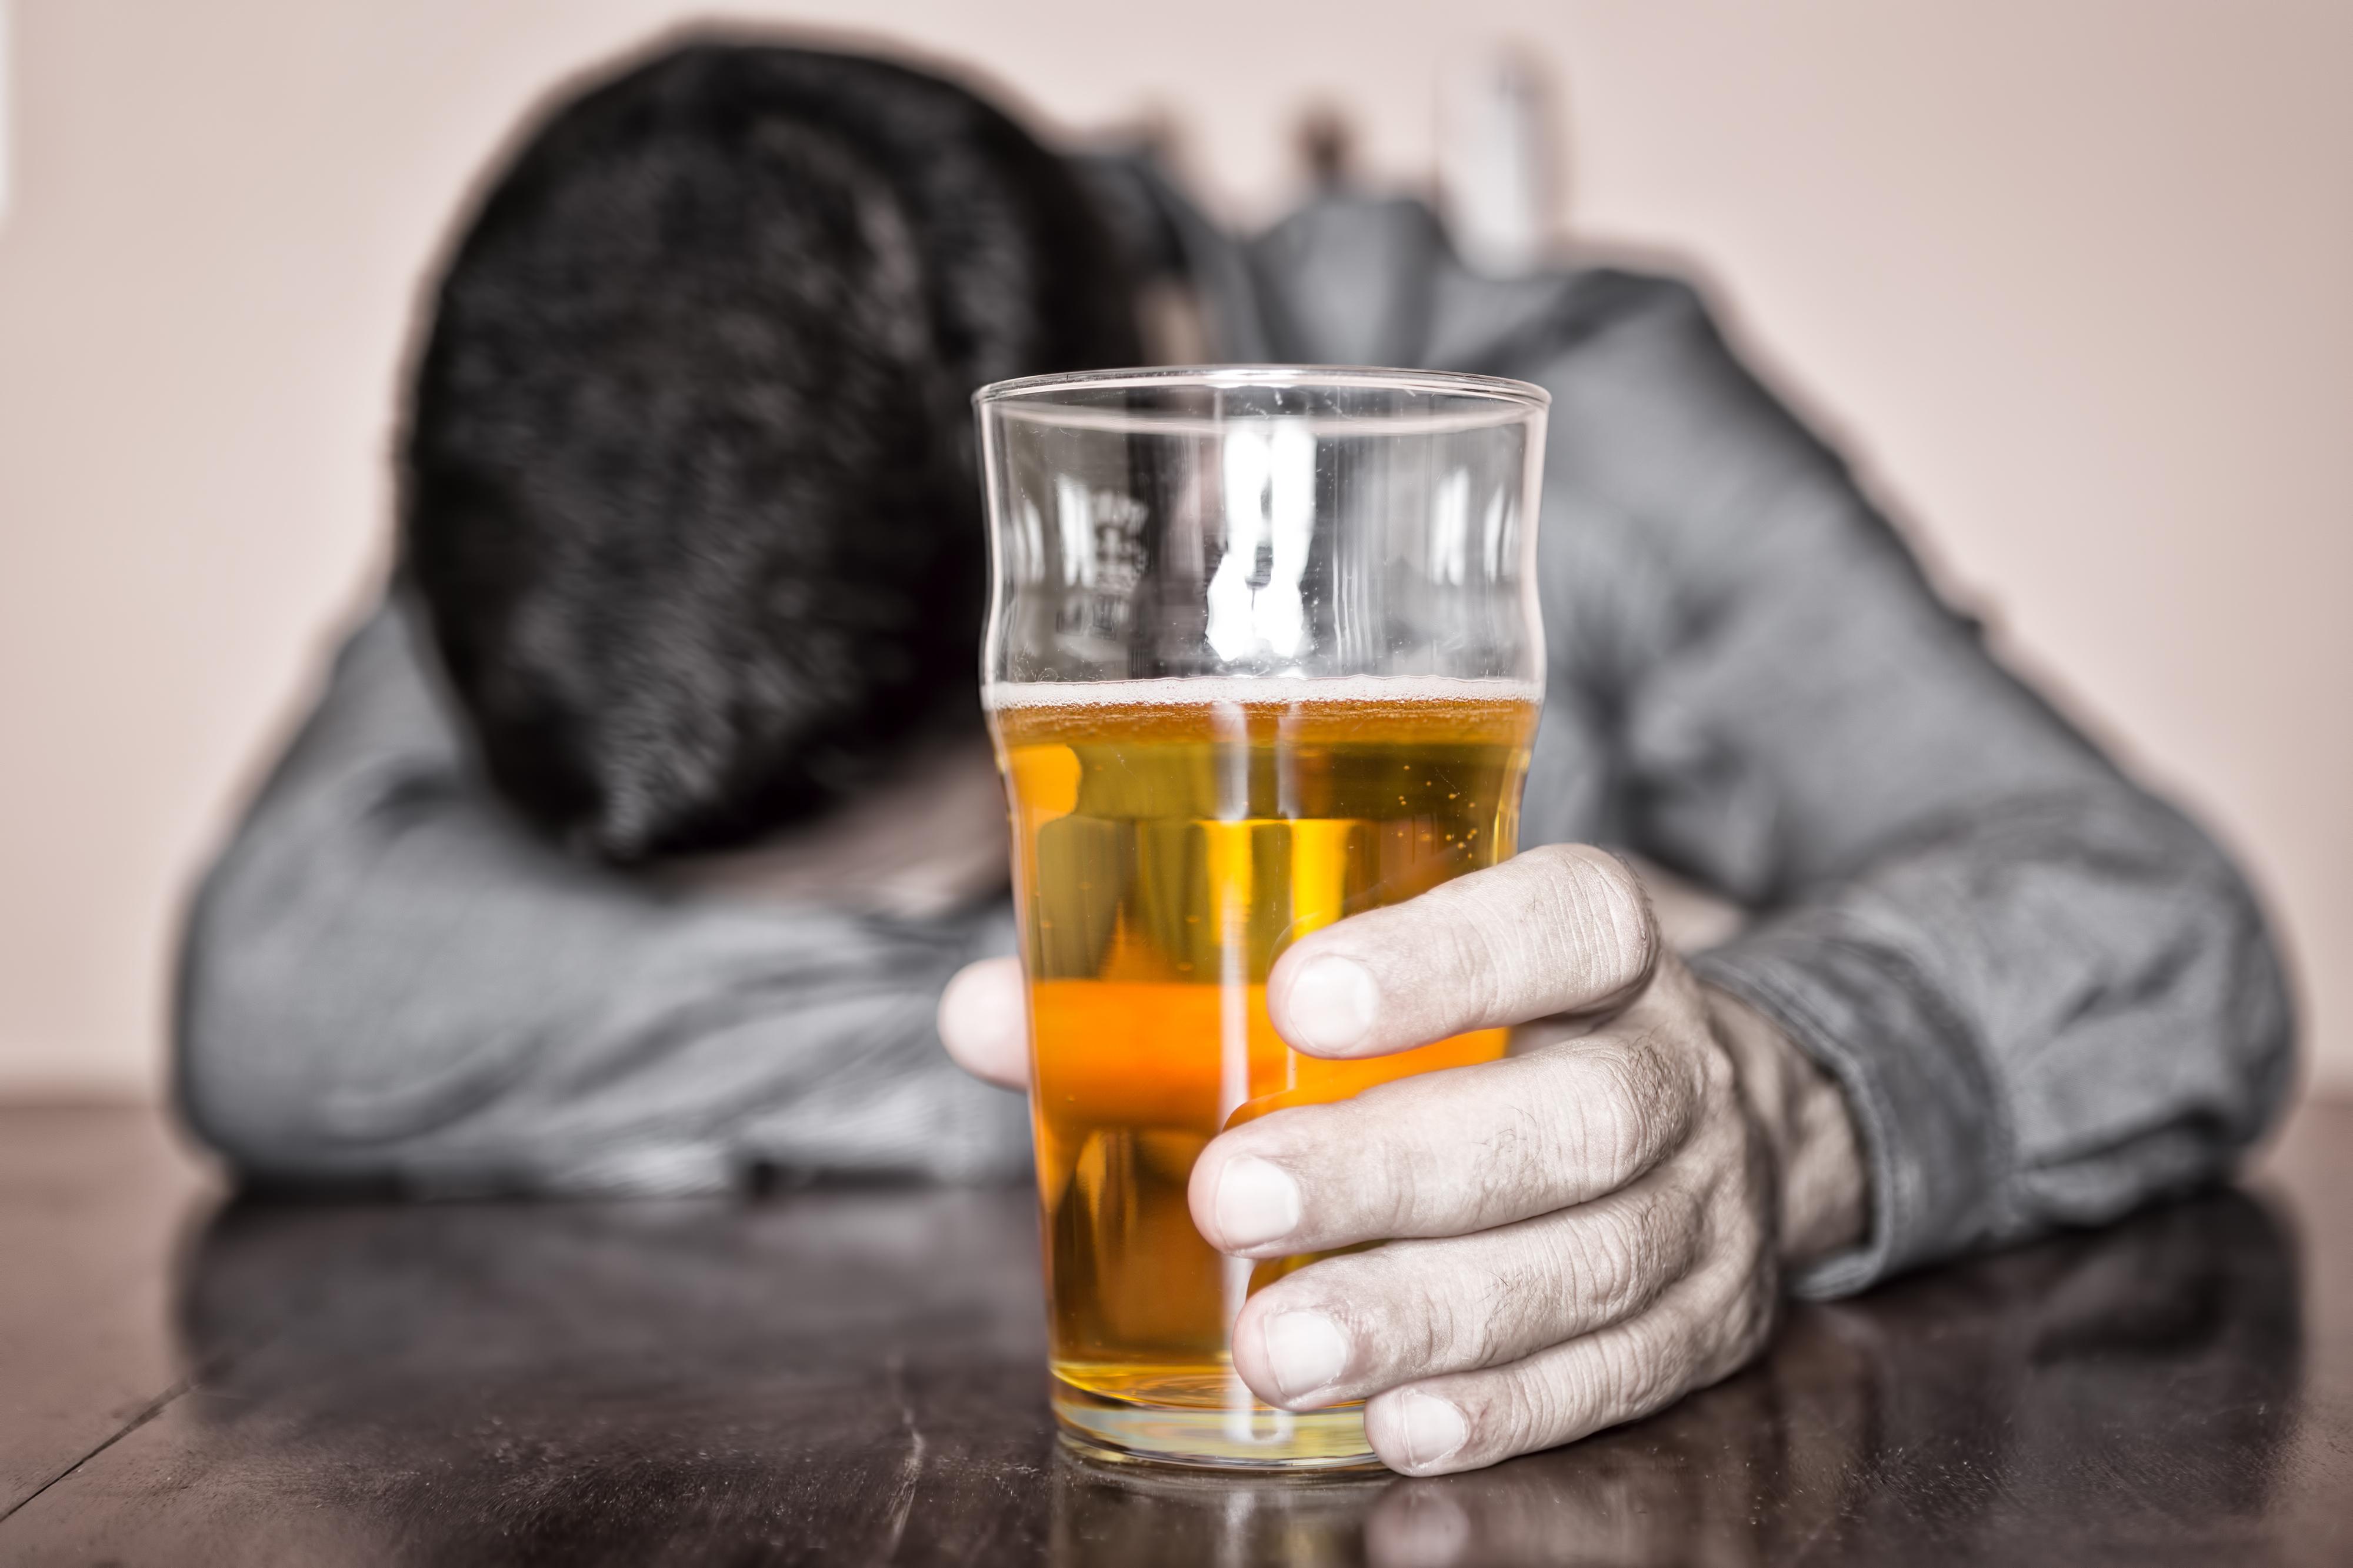 Vshivanie las ampollas del alcoholismo por ukraine